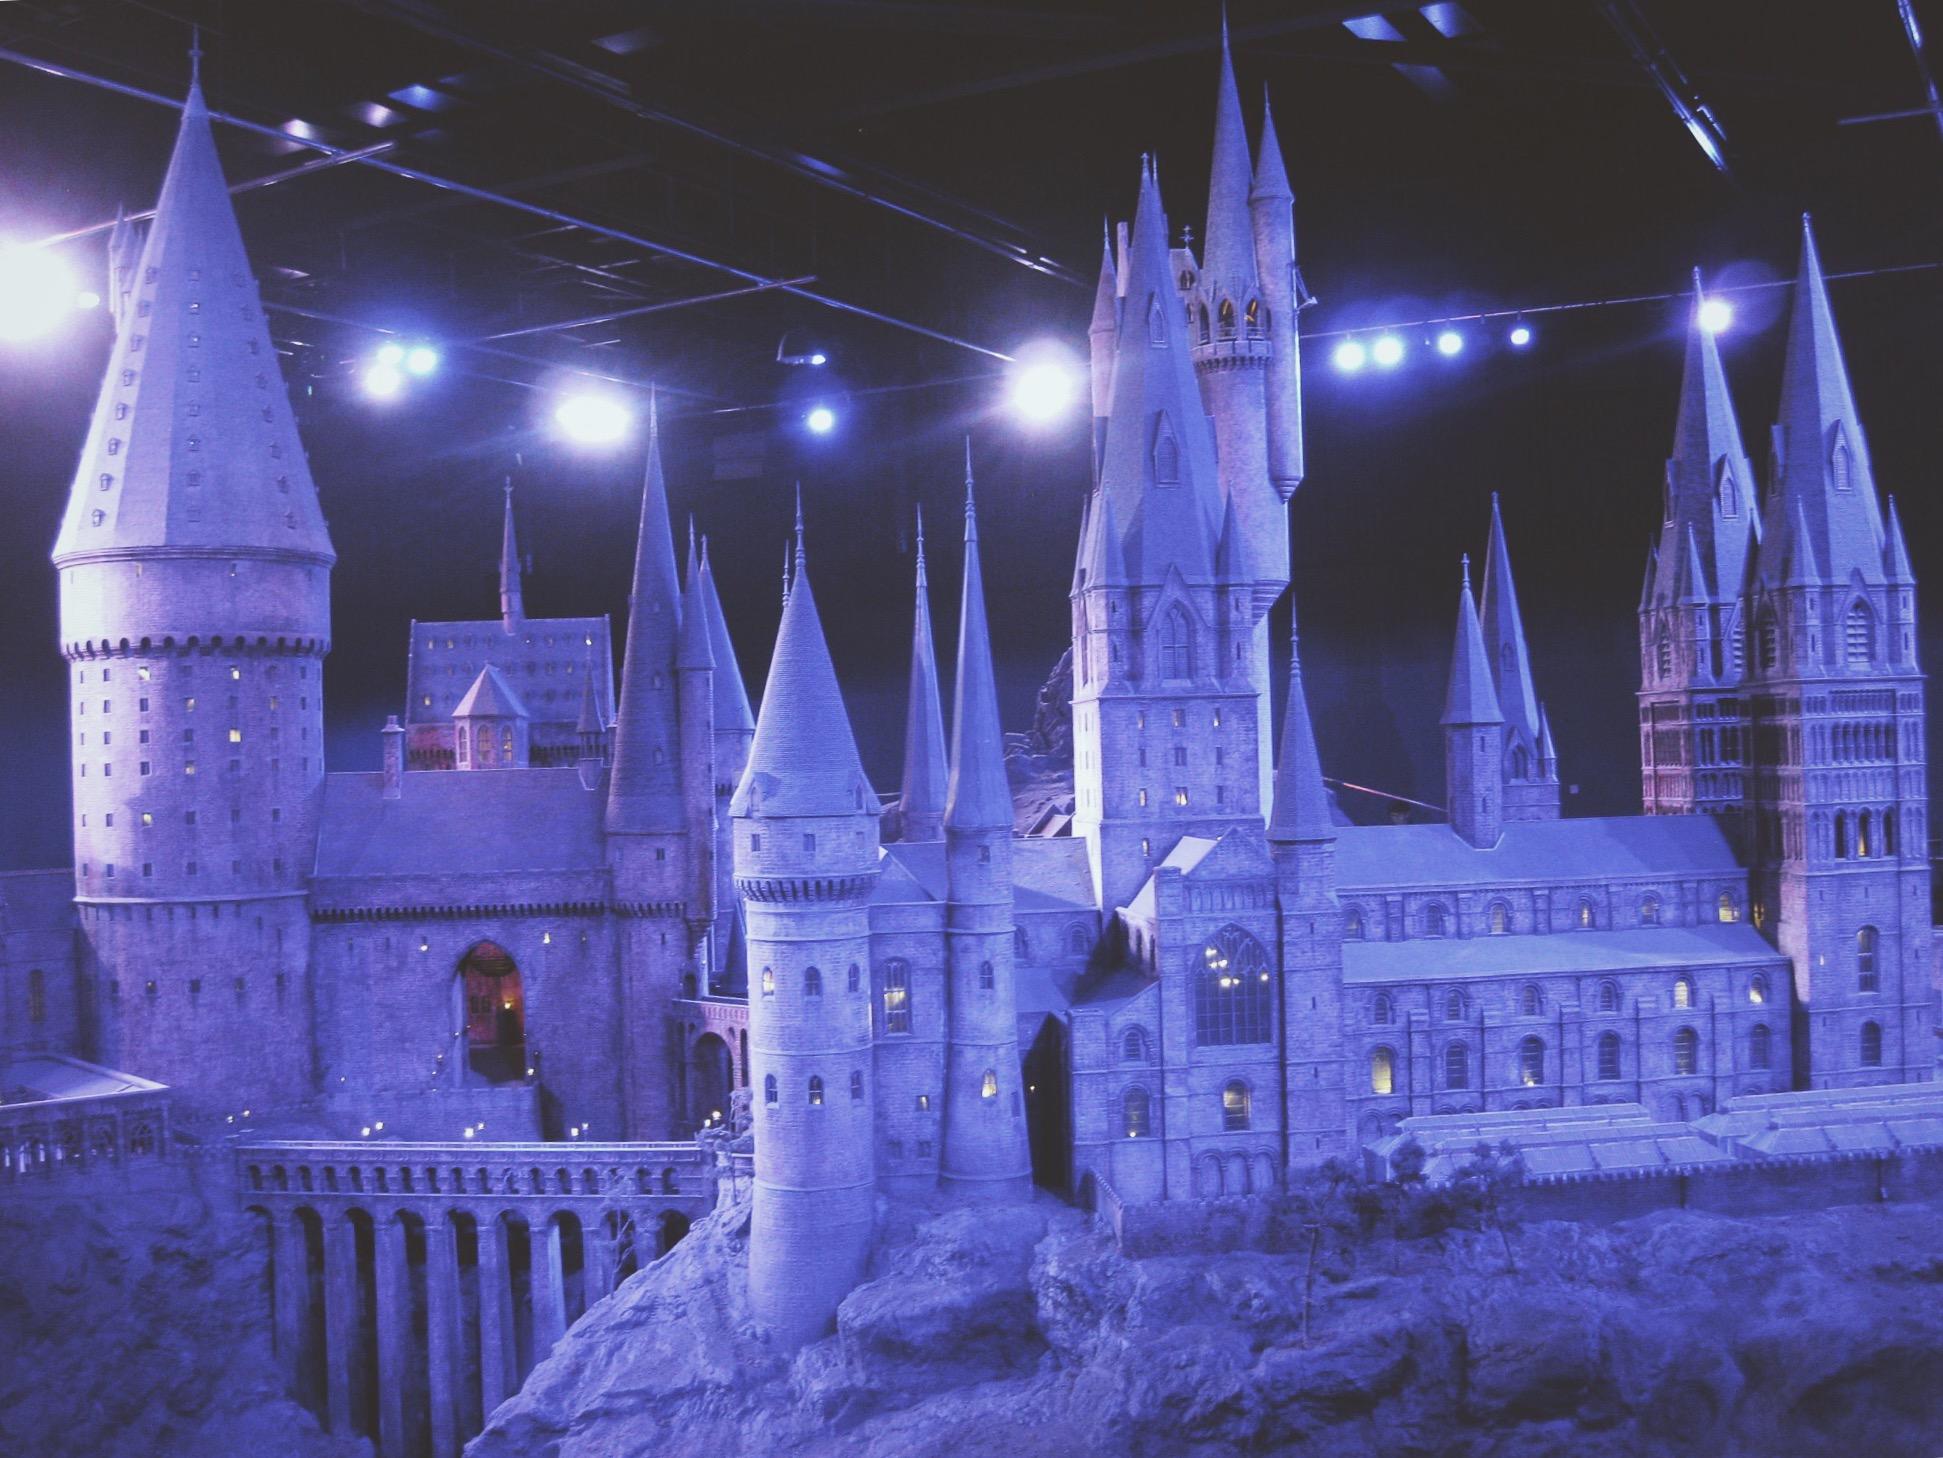 Warner Bros. Studio Tour London - The Making of Harry Potter, London, Travel, Film, Books